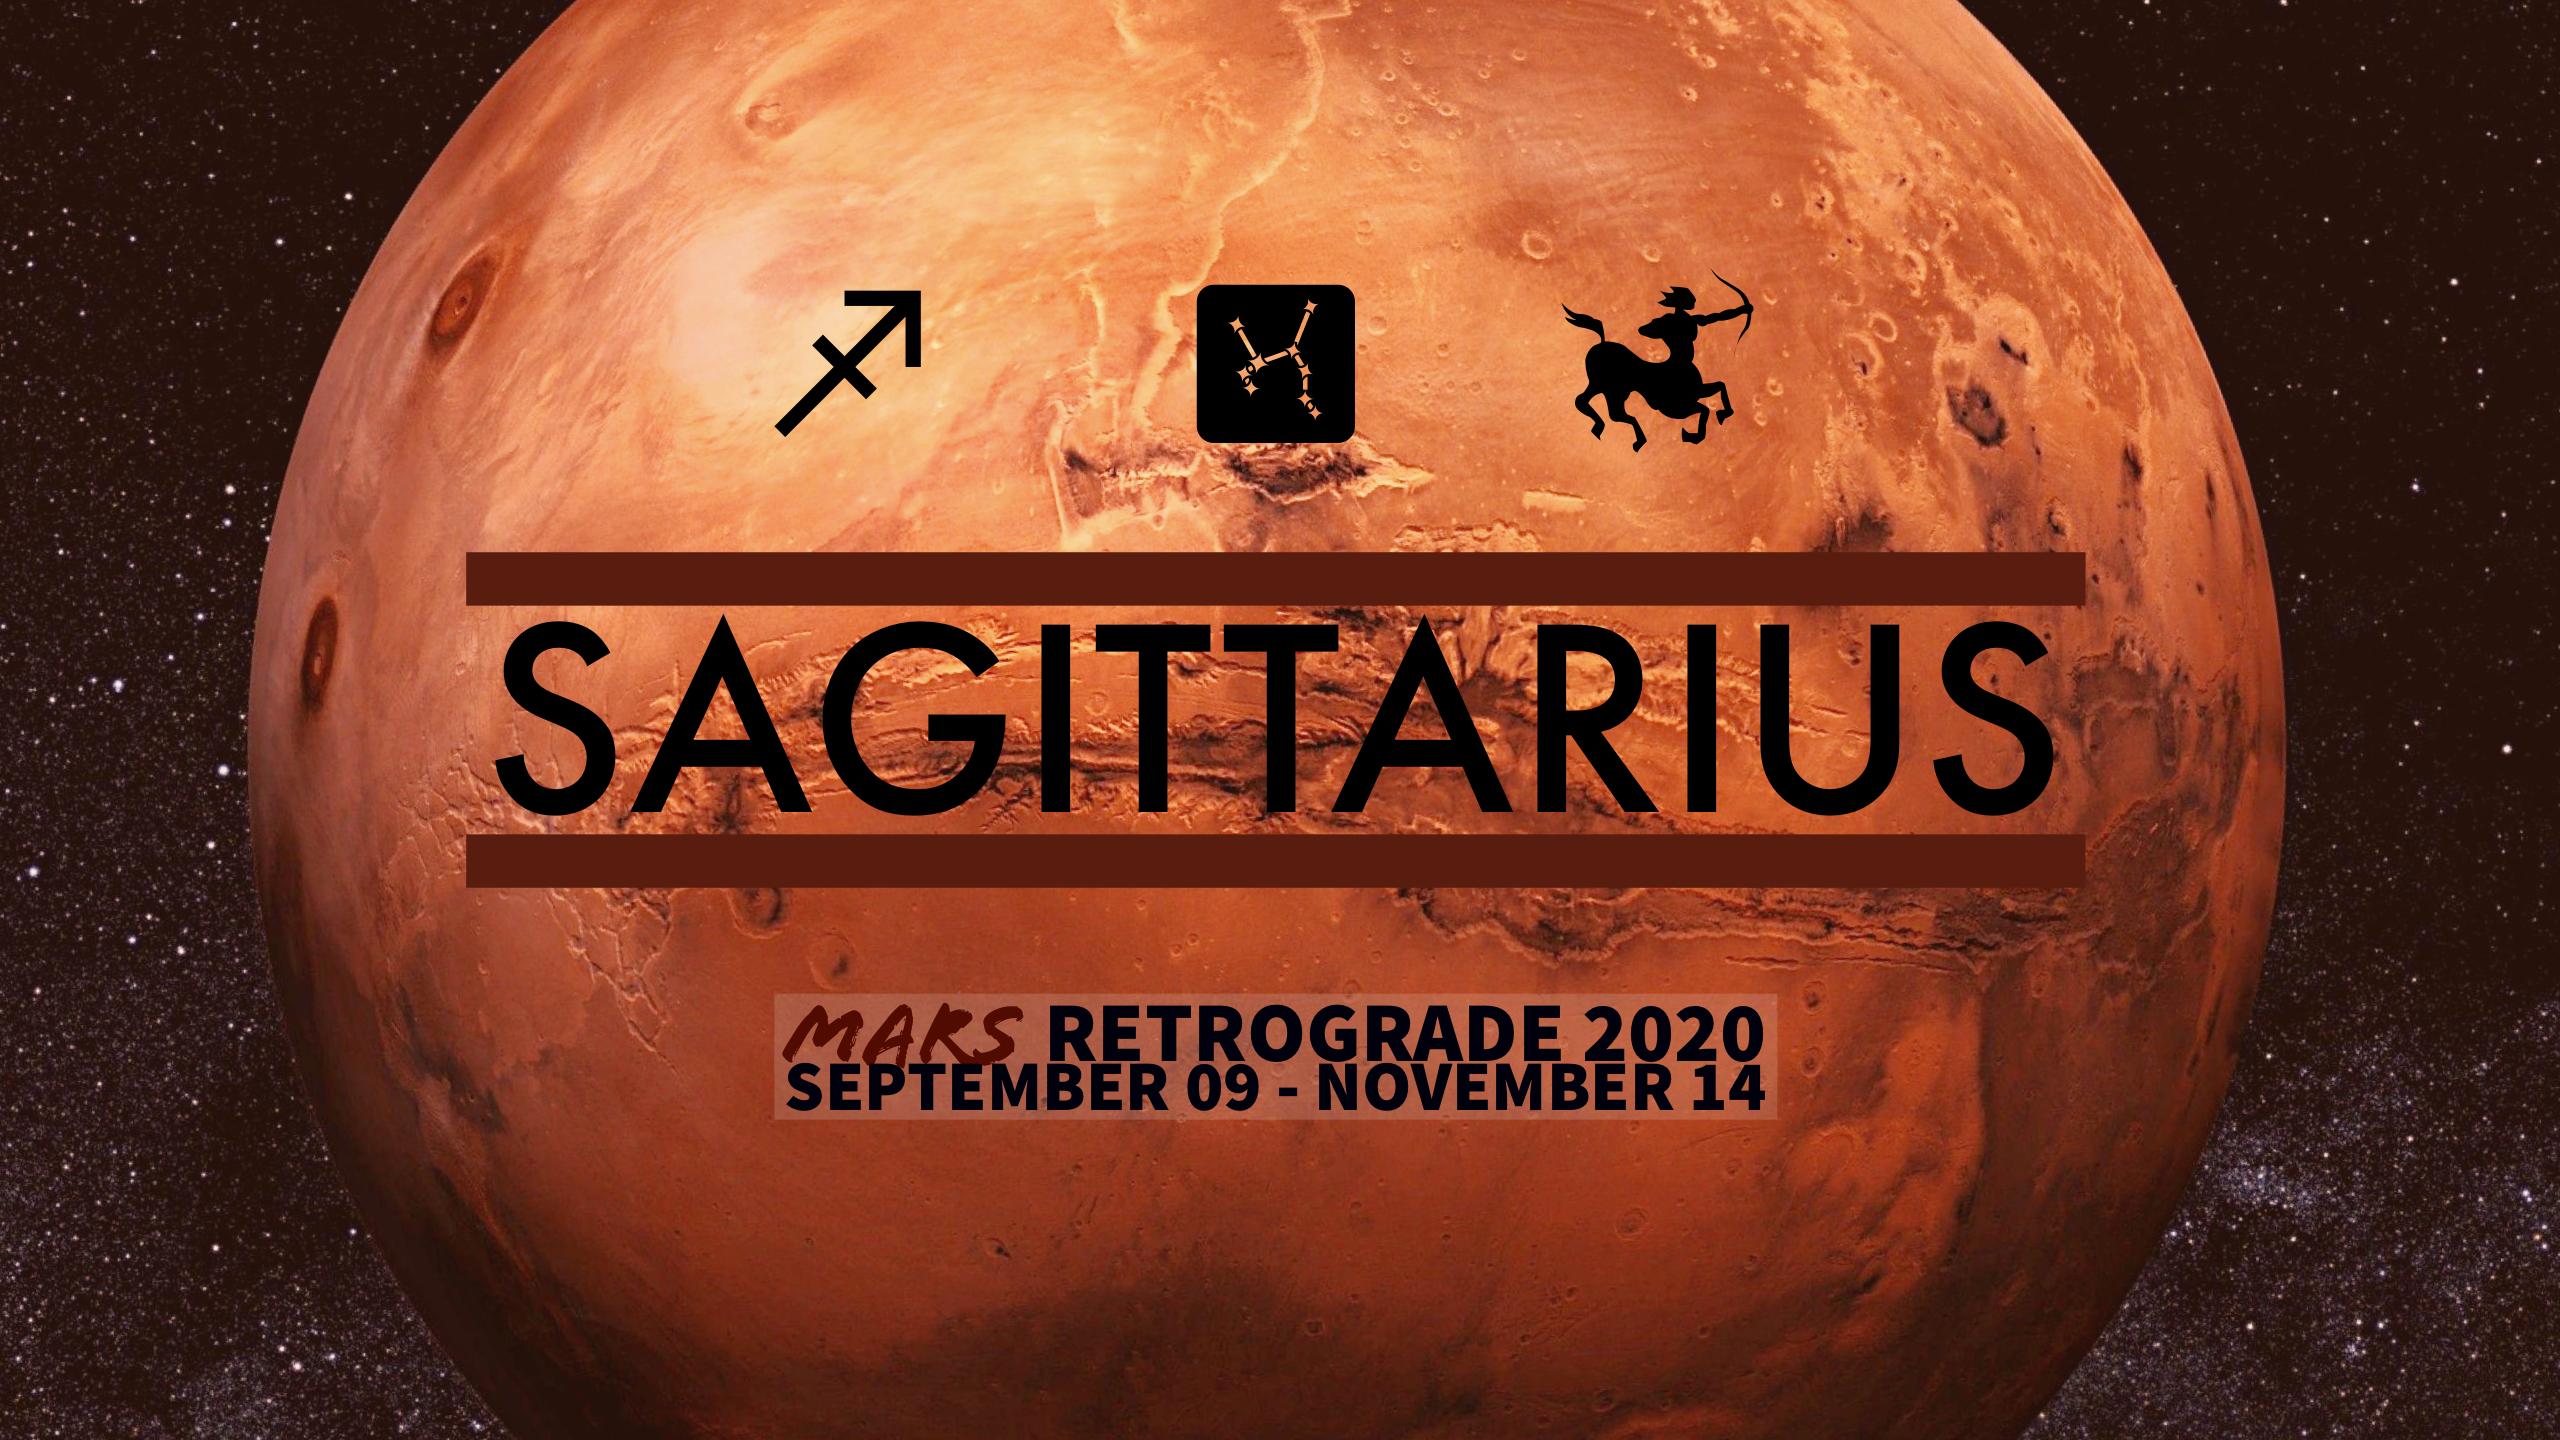 2020 Mars Retrograde:09 Sagittarius